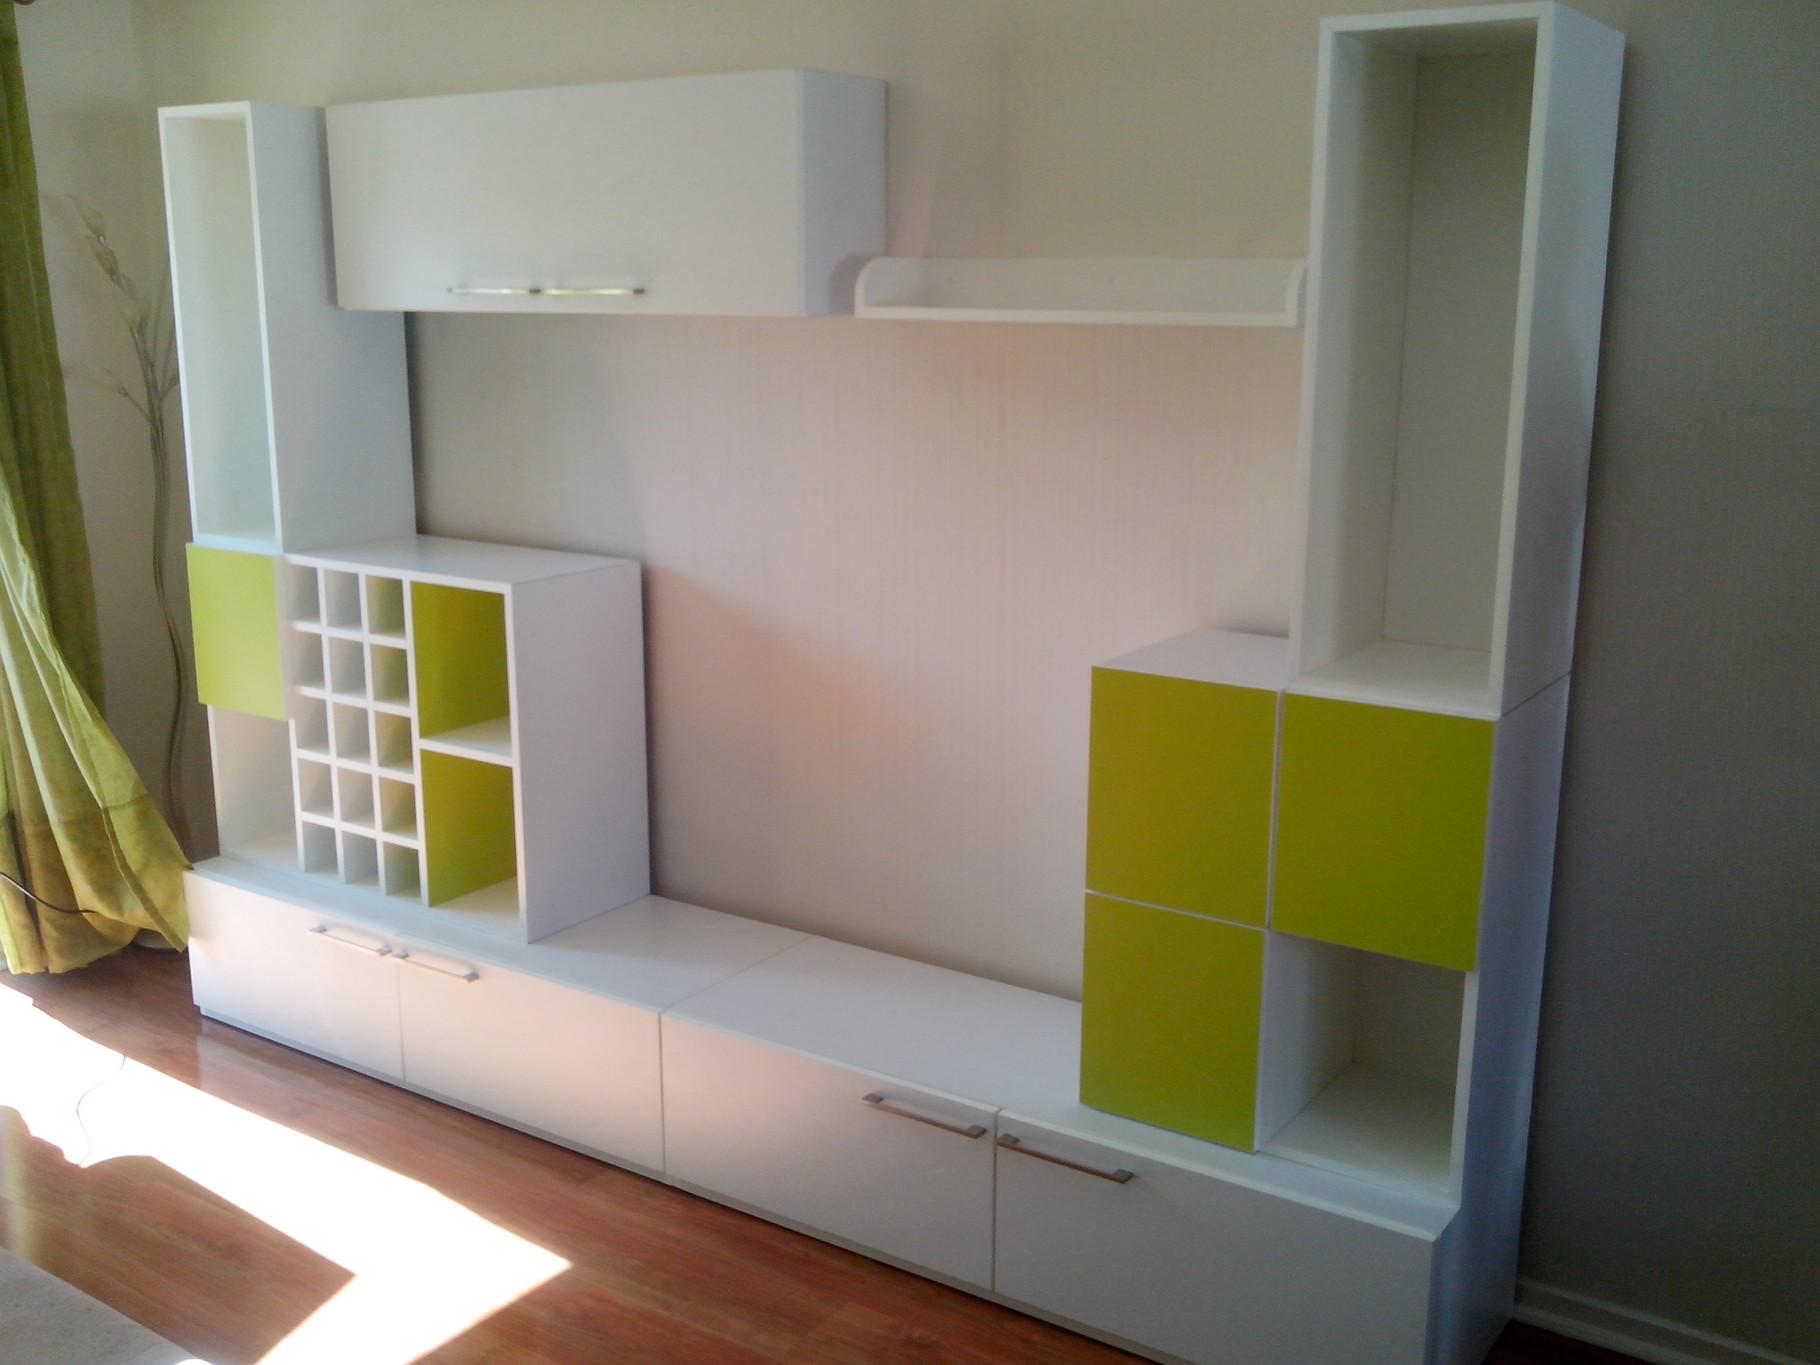 Muebles Modulares Mr Muebles Modulares Para Locales